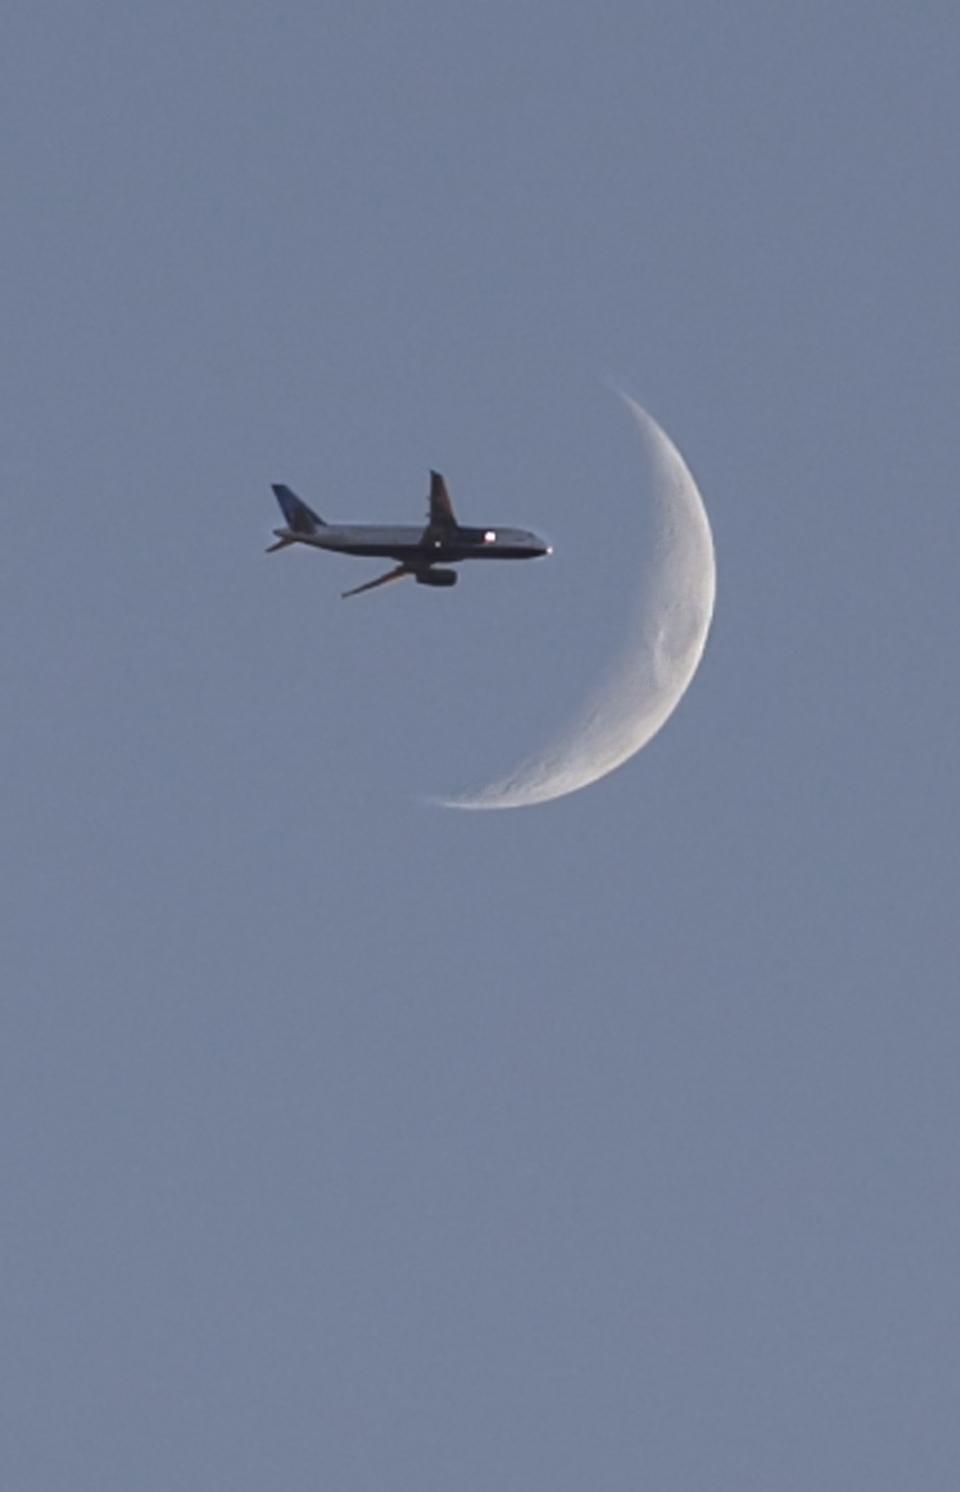 PLane-moon.jpg